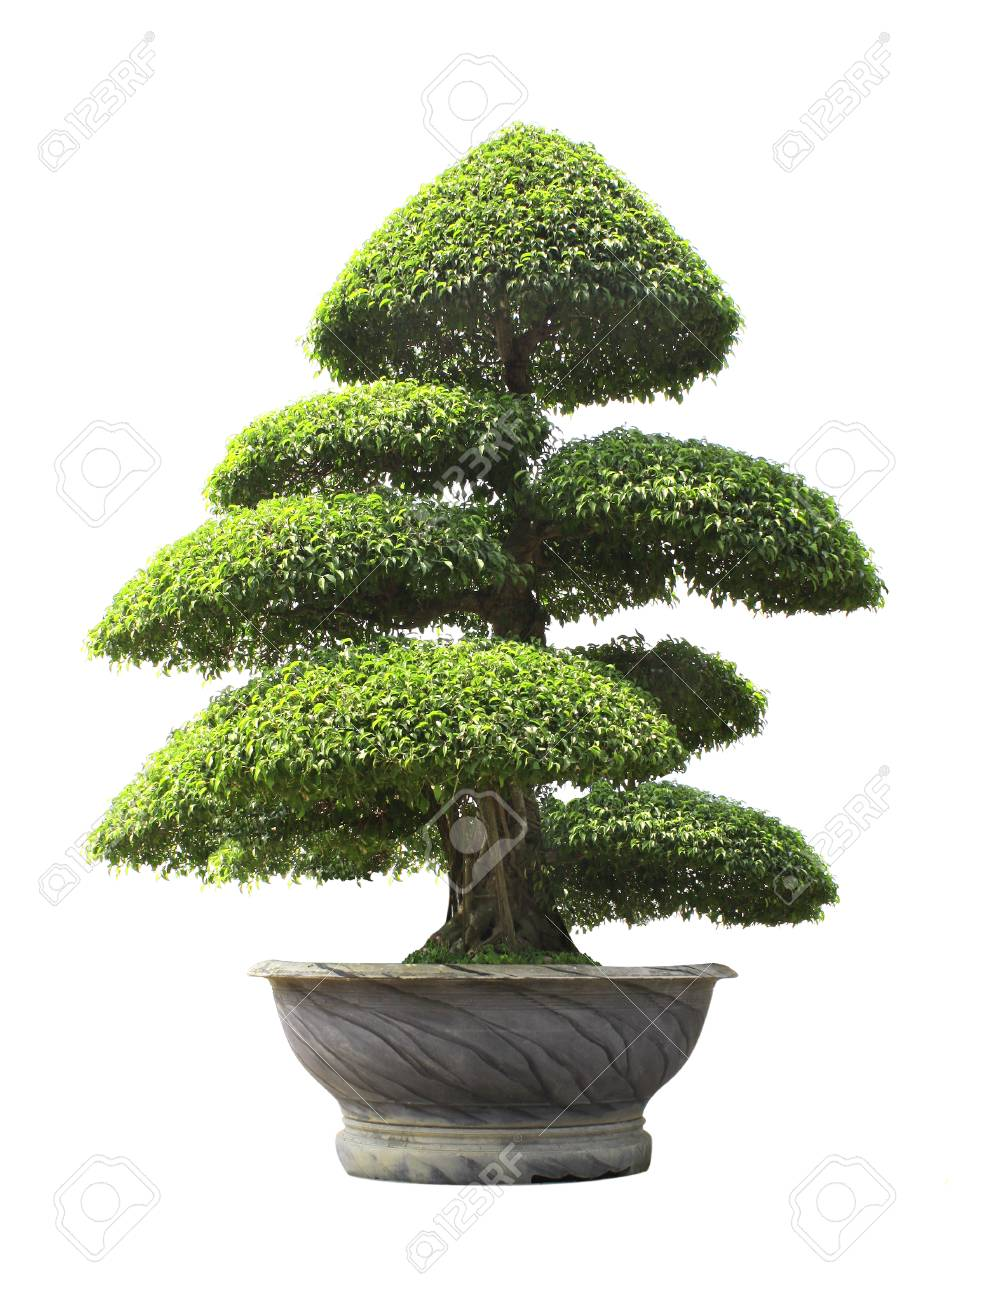 256 & Bonsai Ficus benjamina in stone flower pot. Isolated on white..